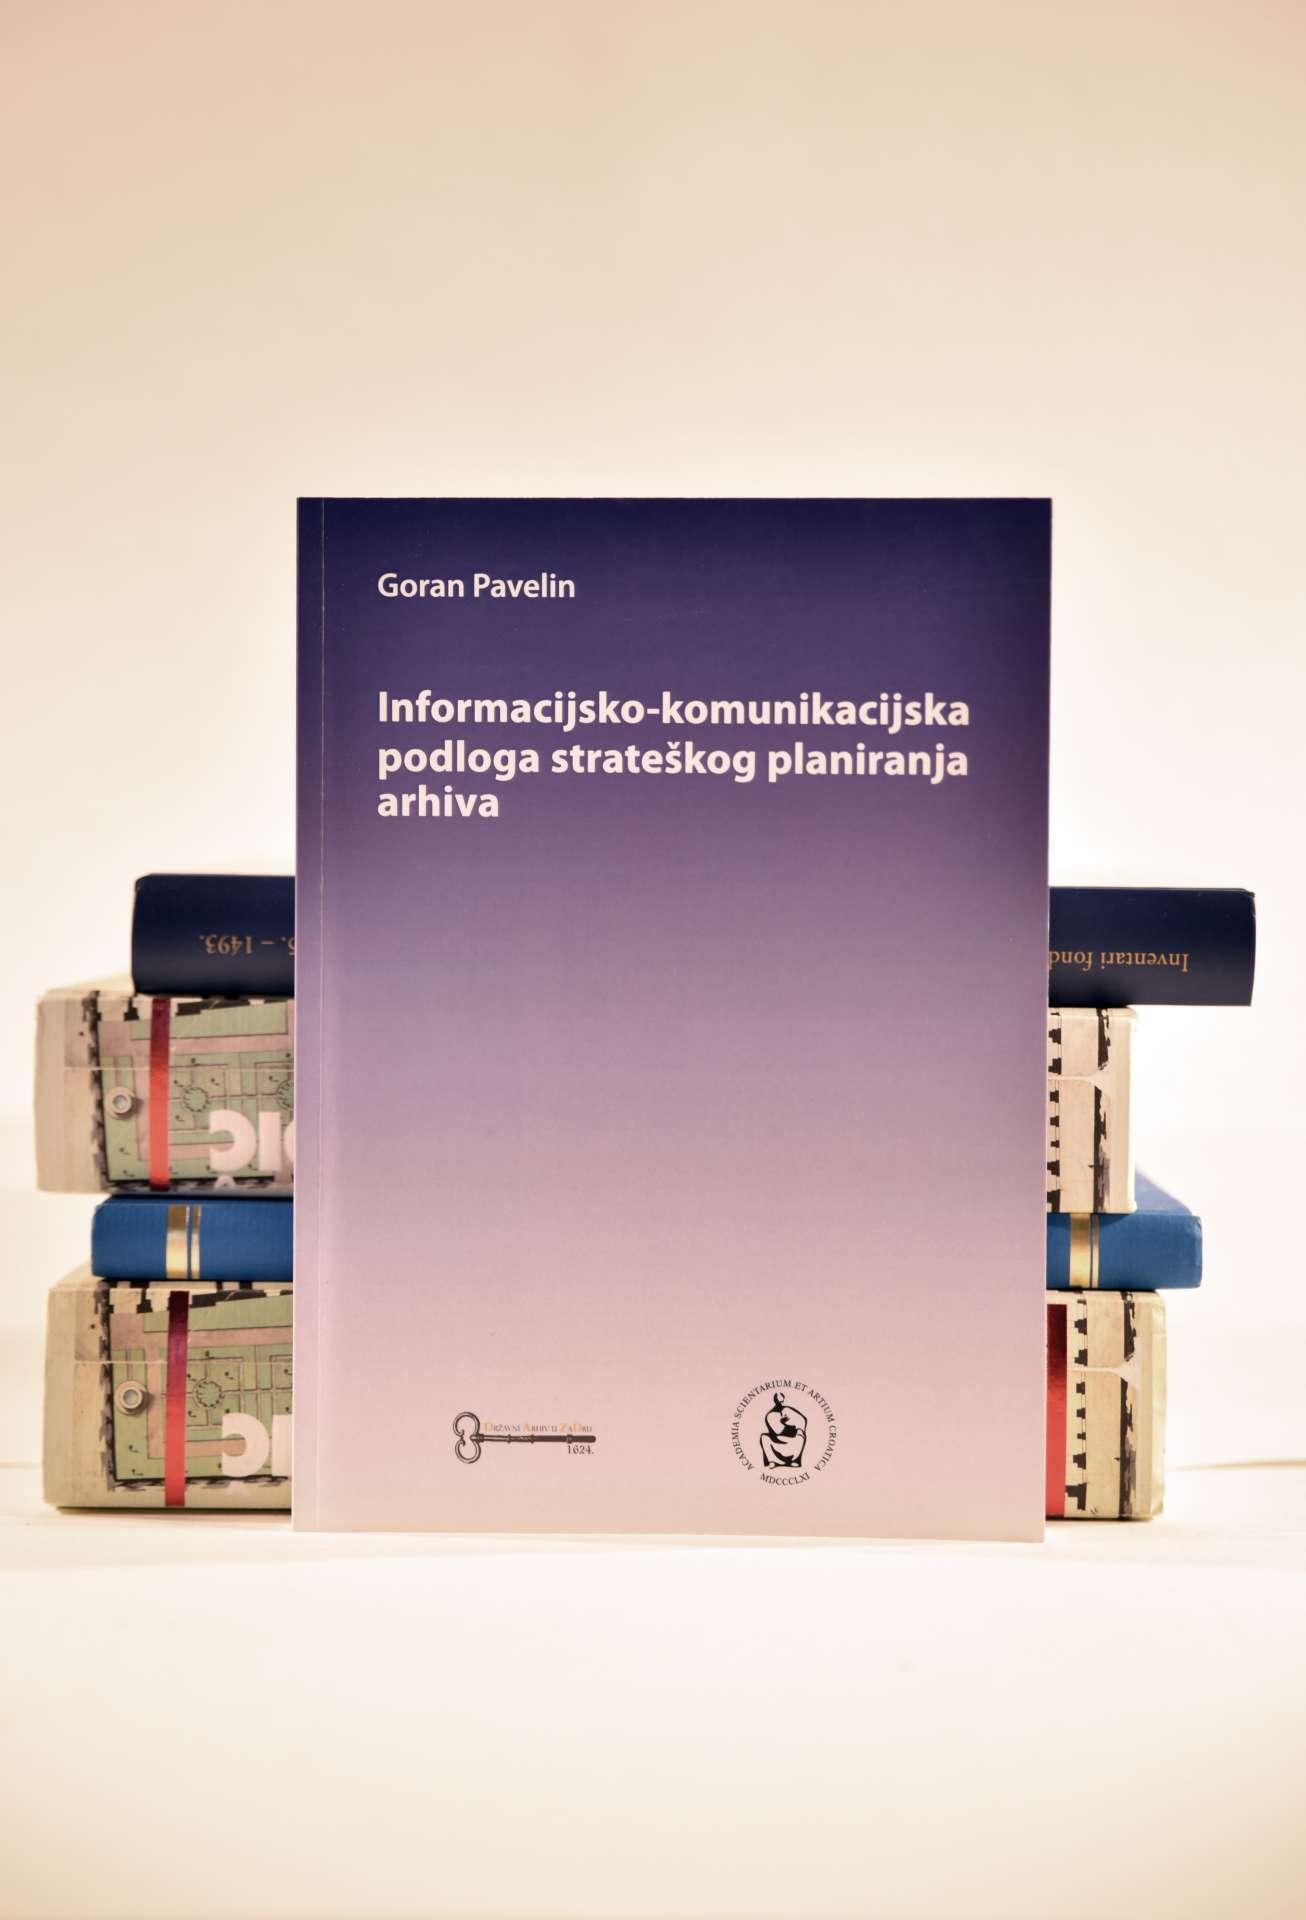 Informacijsko-komunikacijska podlogastrateškog planiranja arhiva